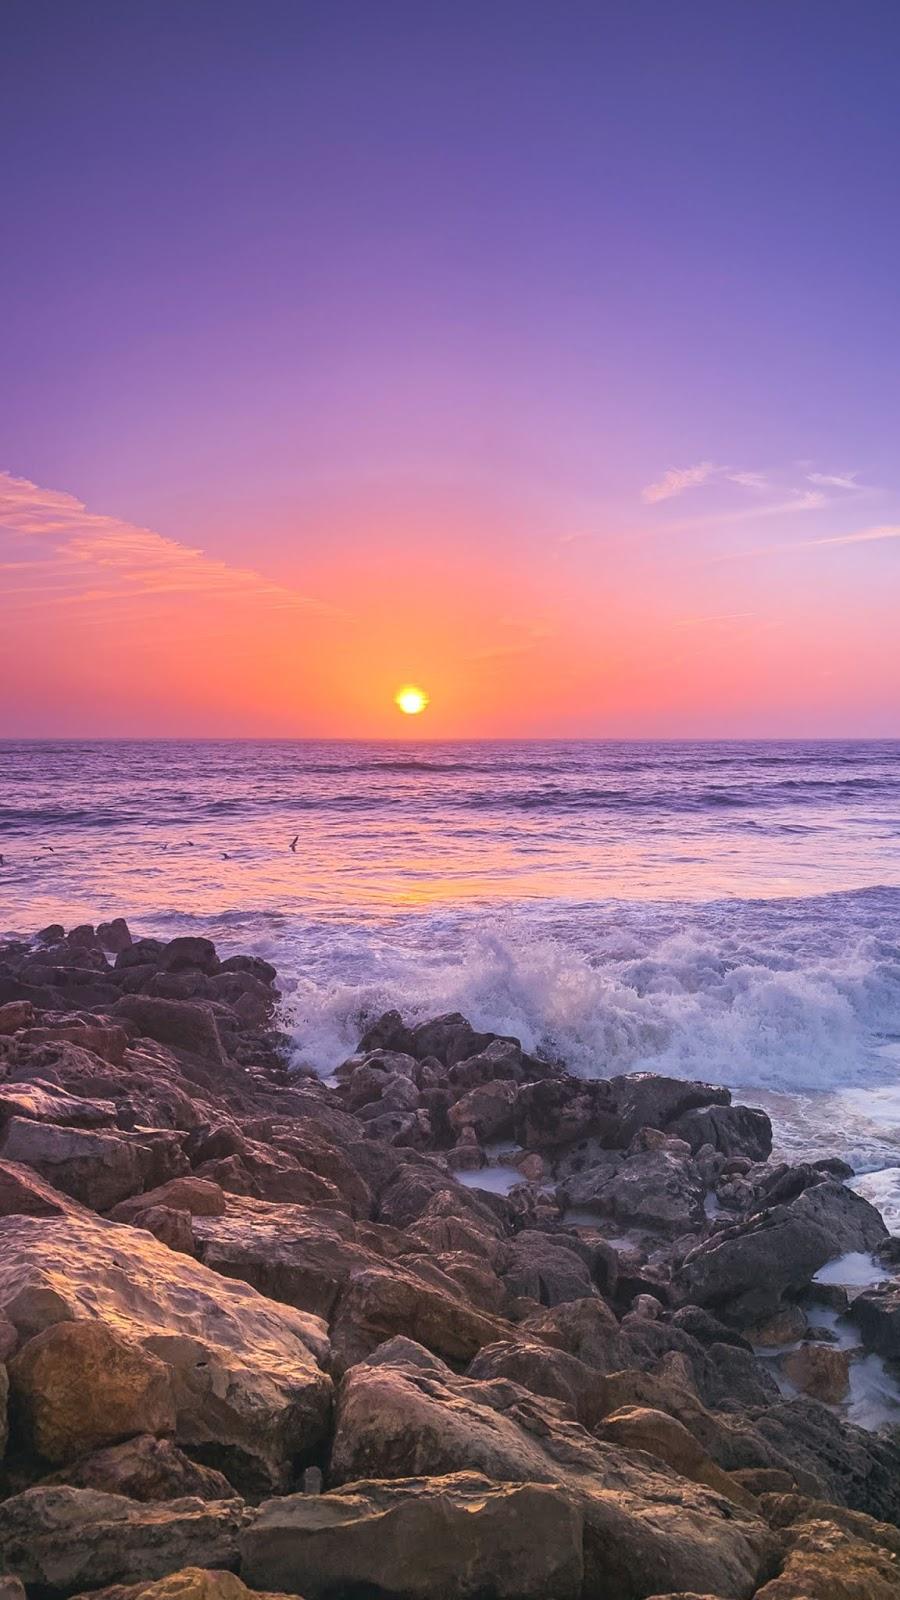 Sunset in the twilight sky